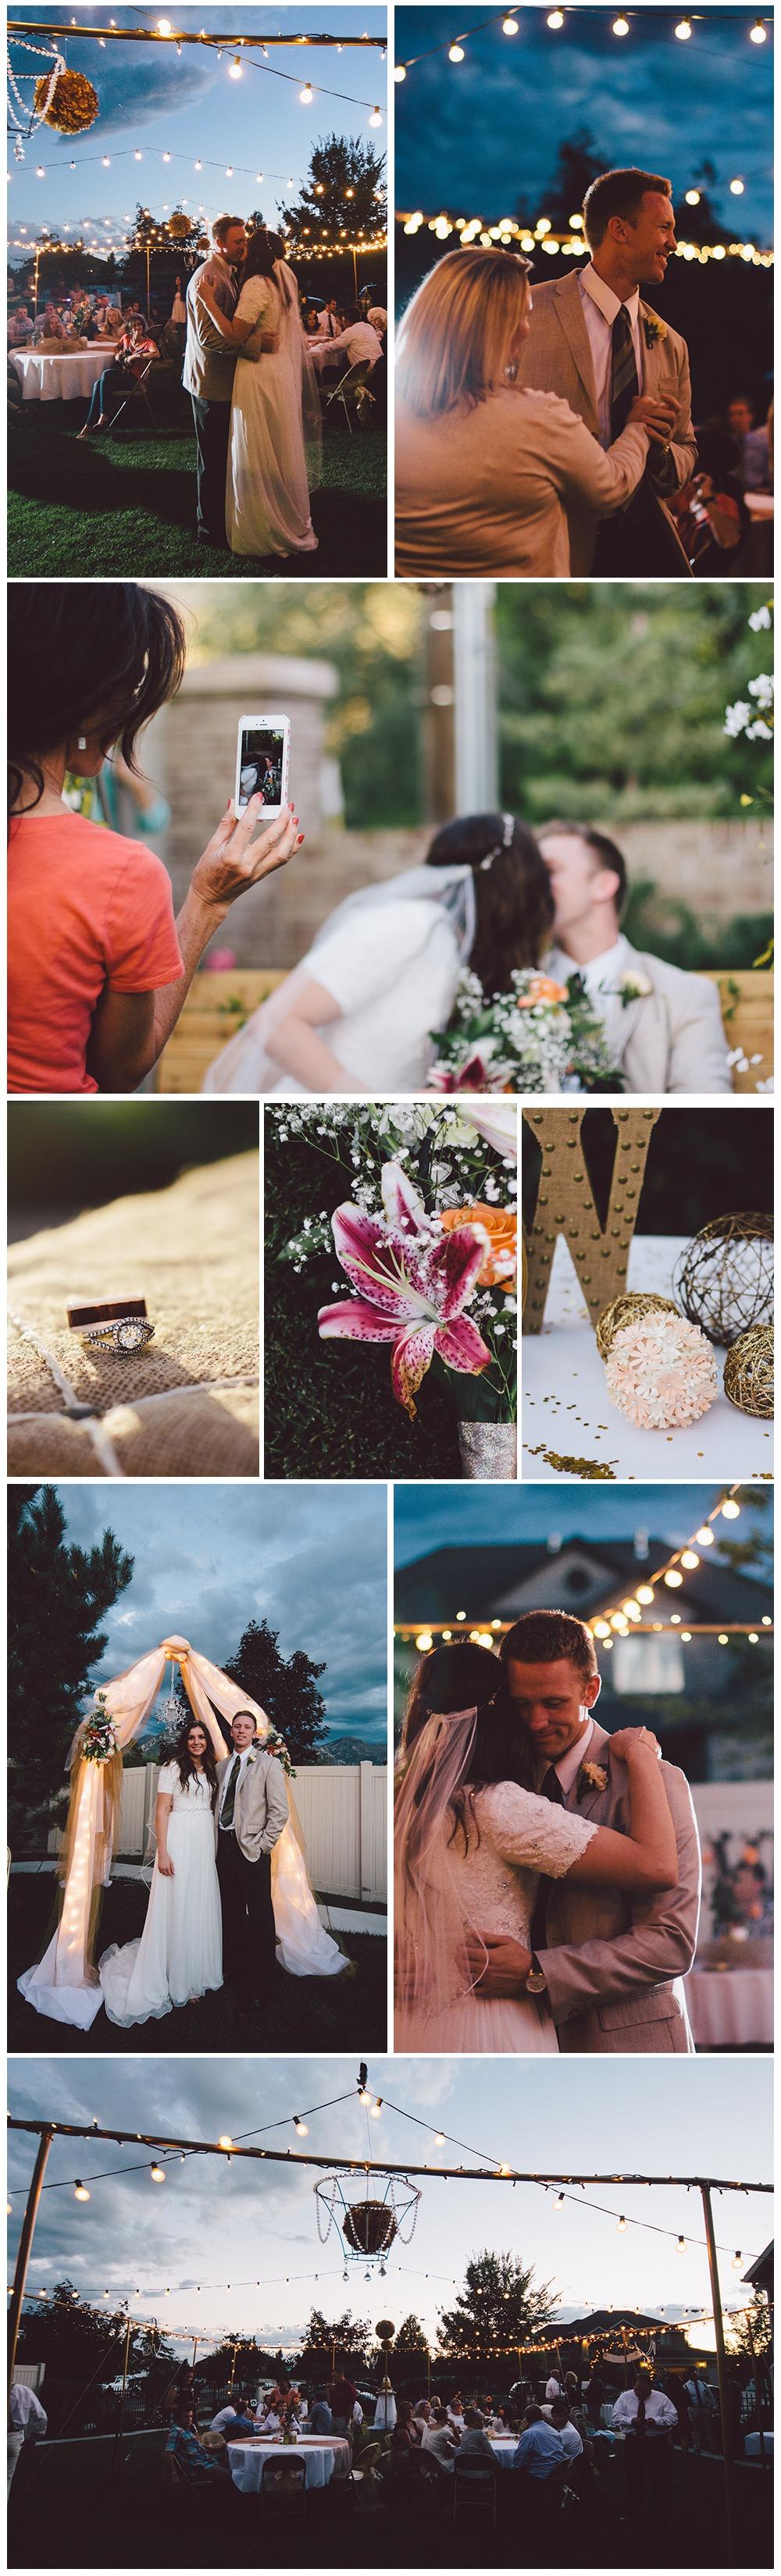 Cheap Wedding Photography Utah: Affordable Wedding Photographer In Utah County, Utah